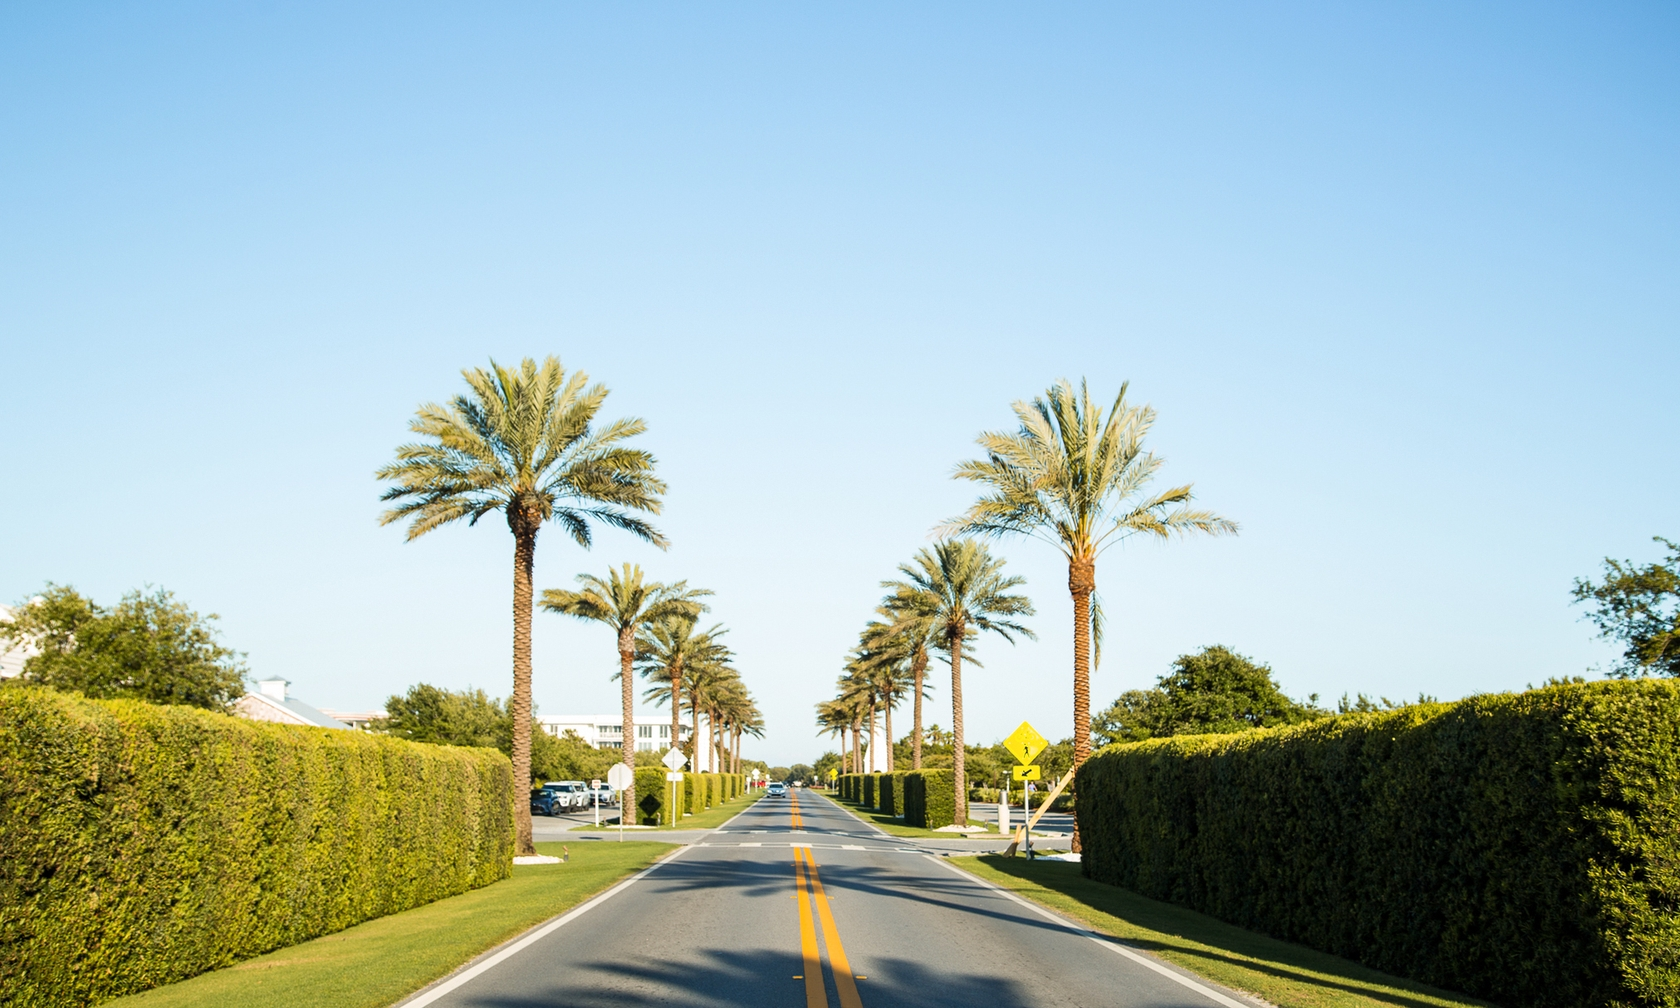 Vacation rentals in Alys Beach